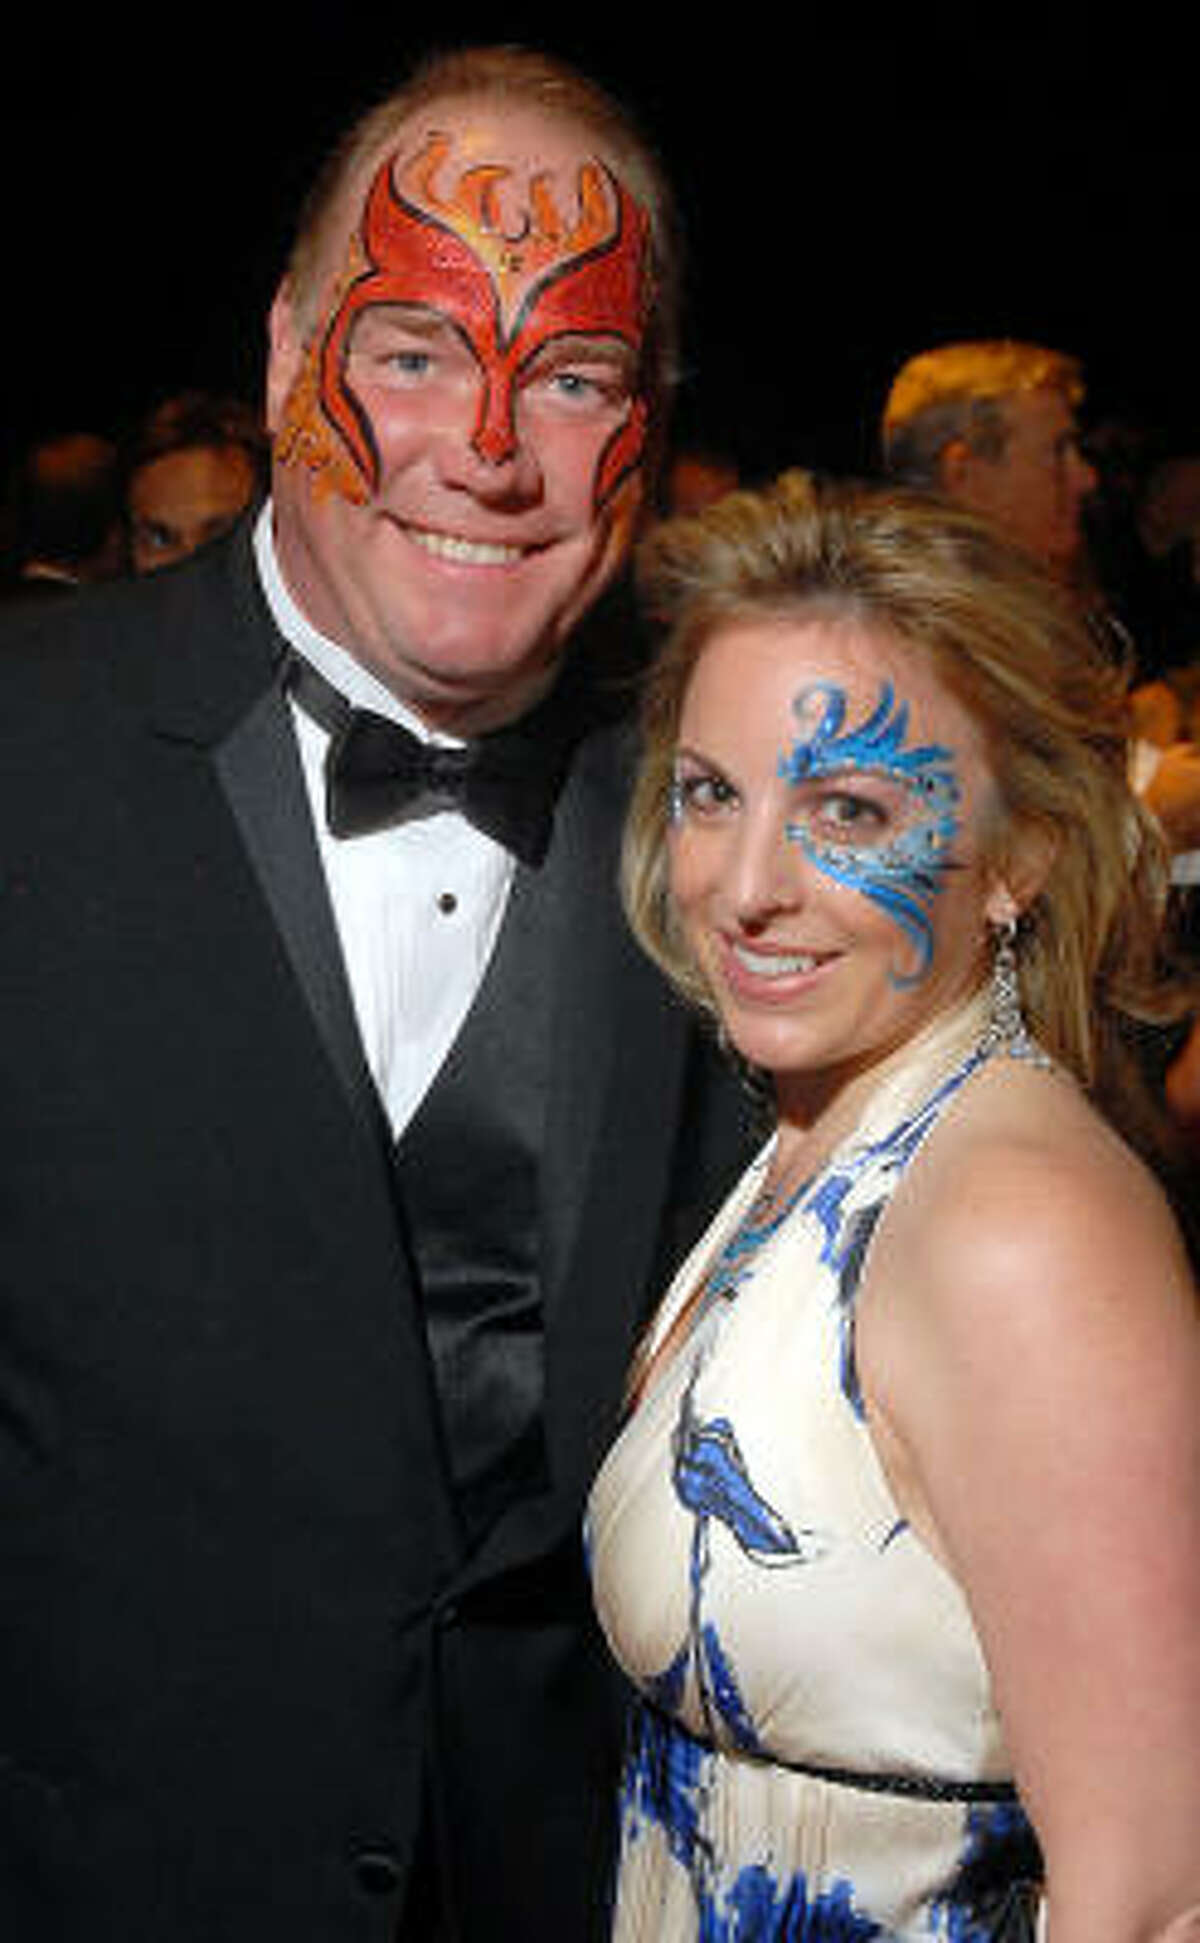 Robert Dale Morgan and Kristy Ralston